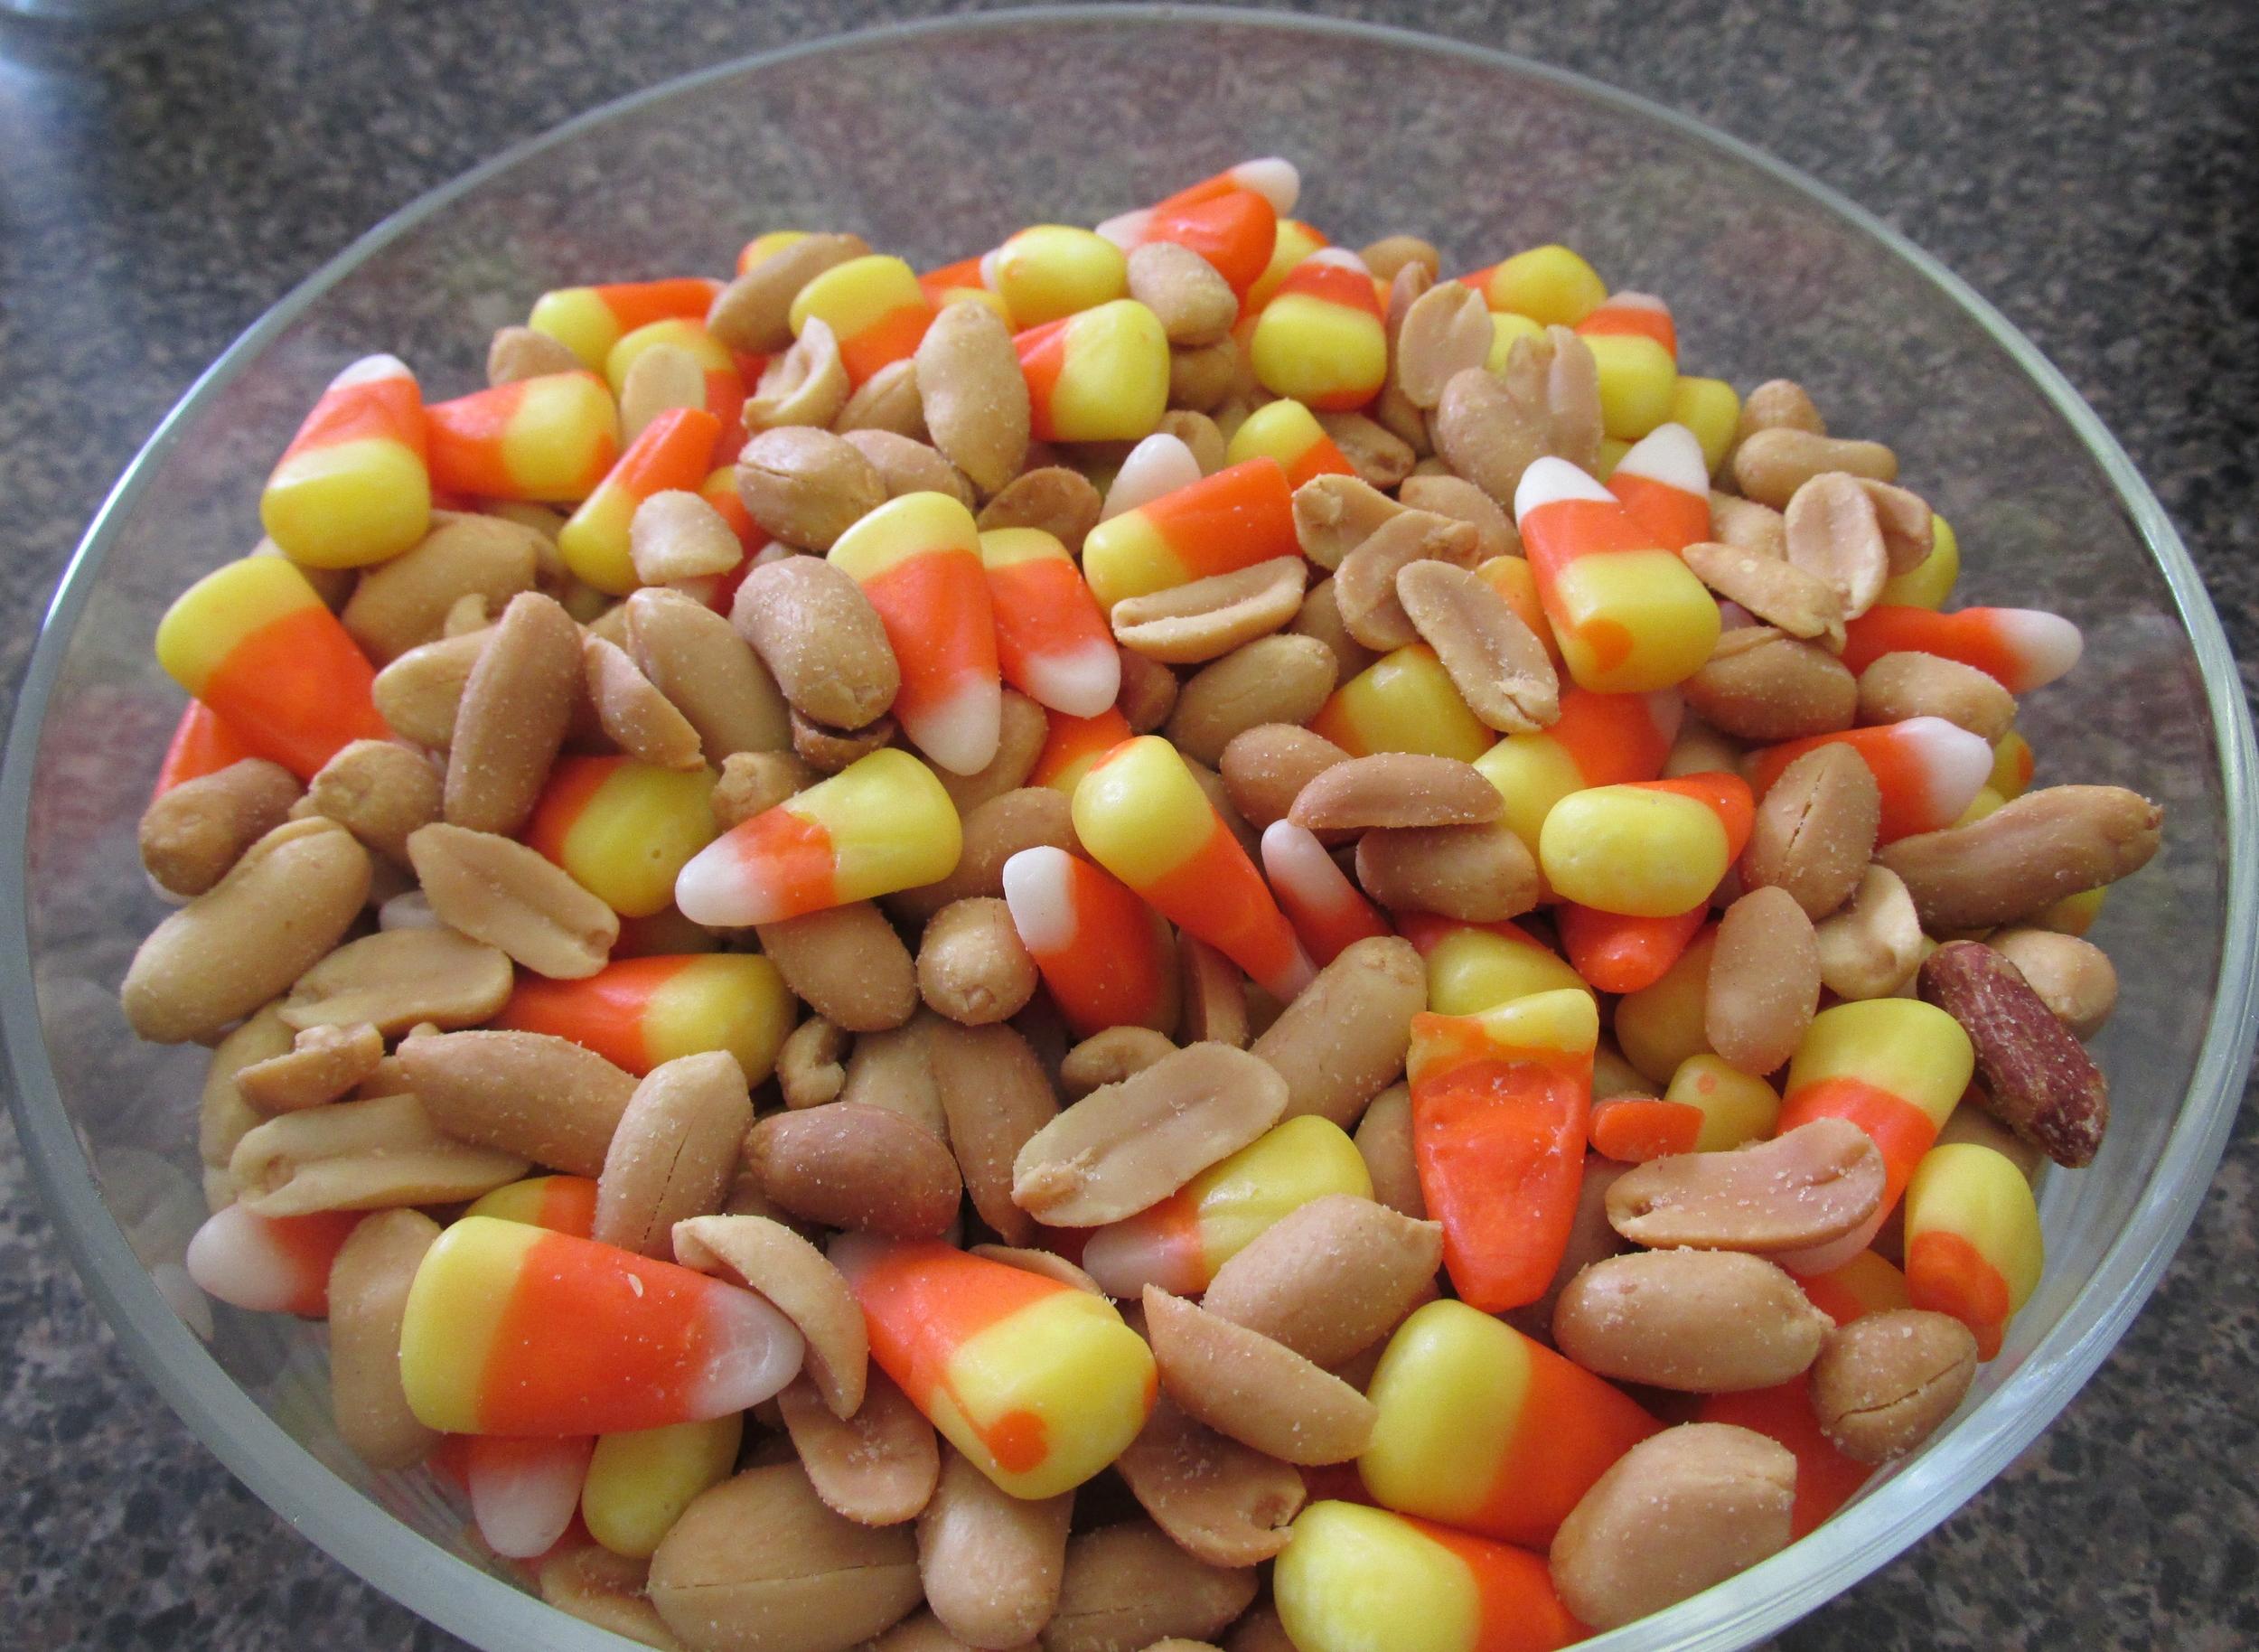 Candycornsnackmix.JPG